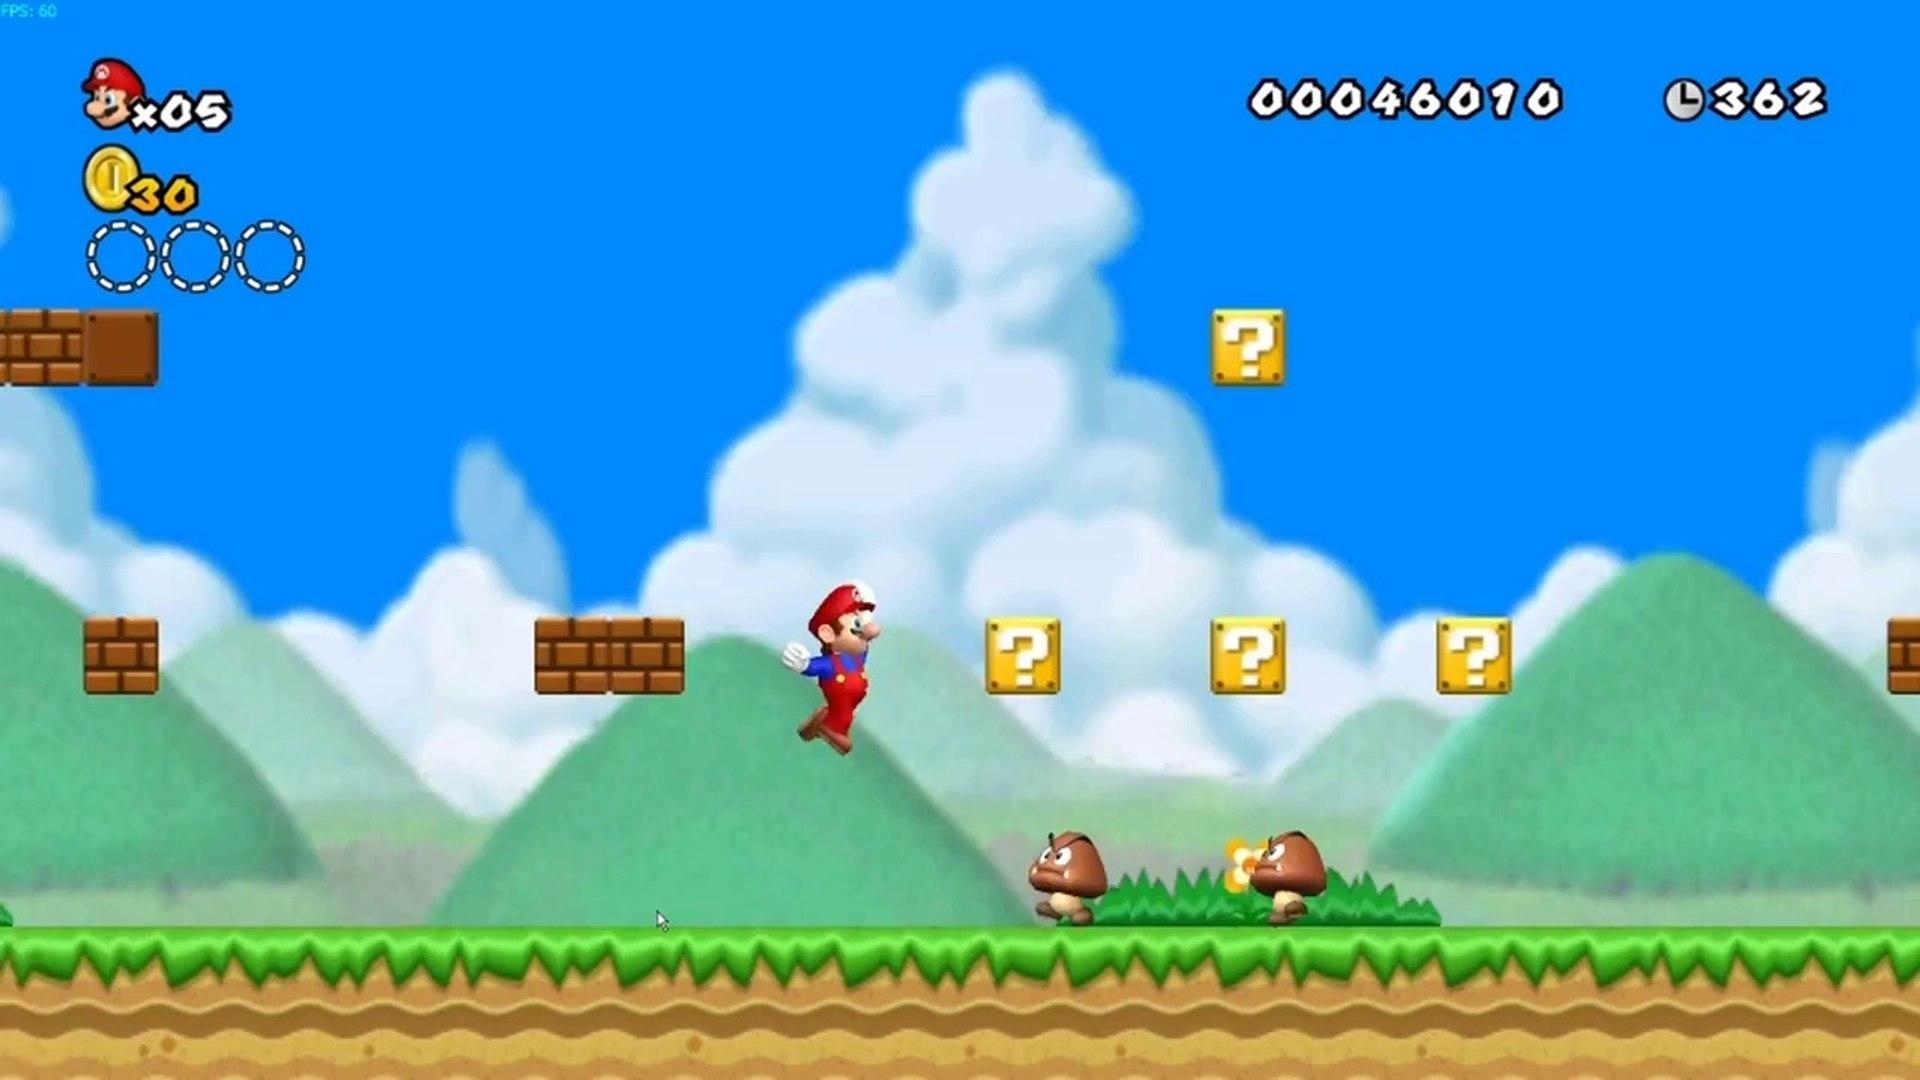 New Super Mario Bros  HD on Dolphin Emulator